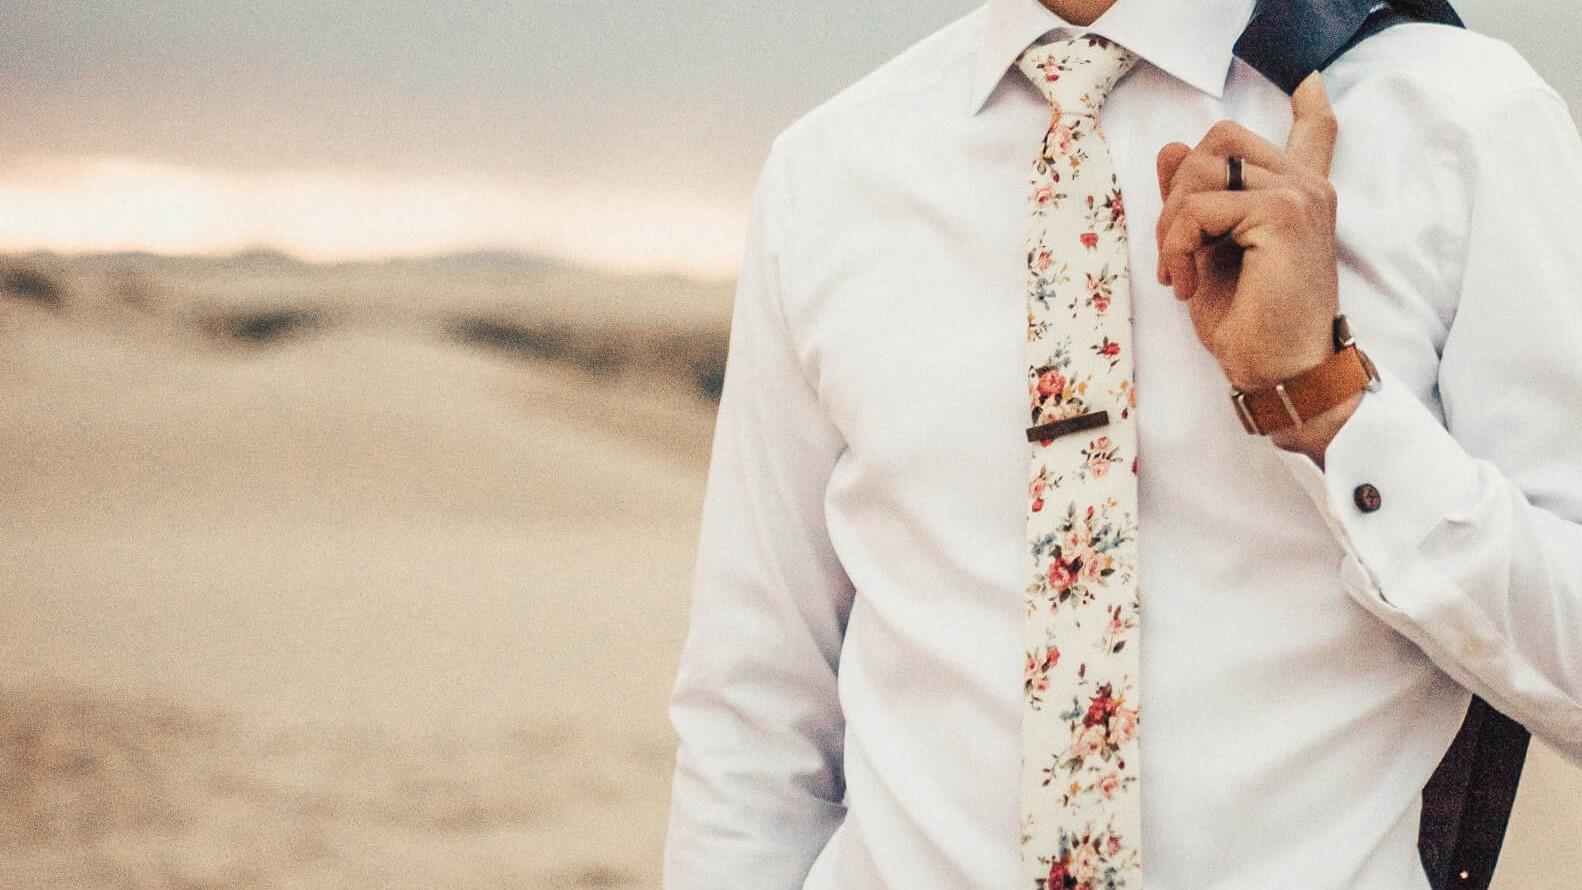 Wedding Tie